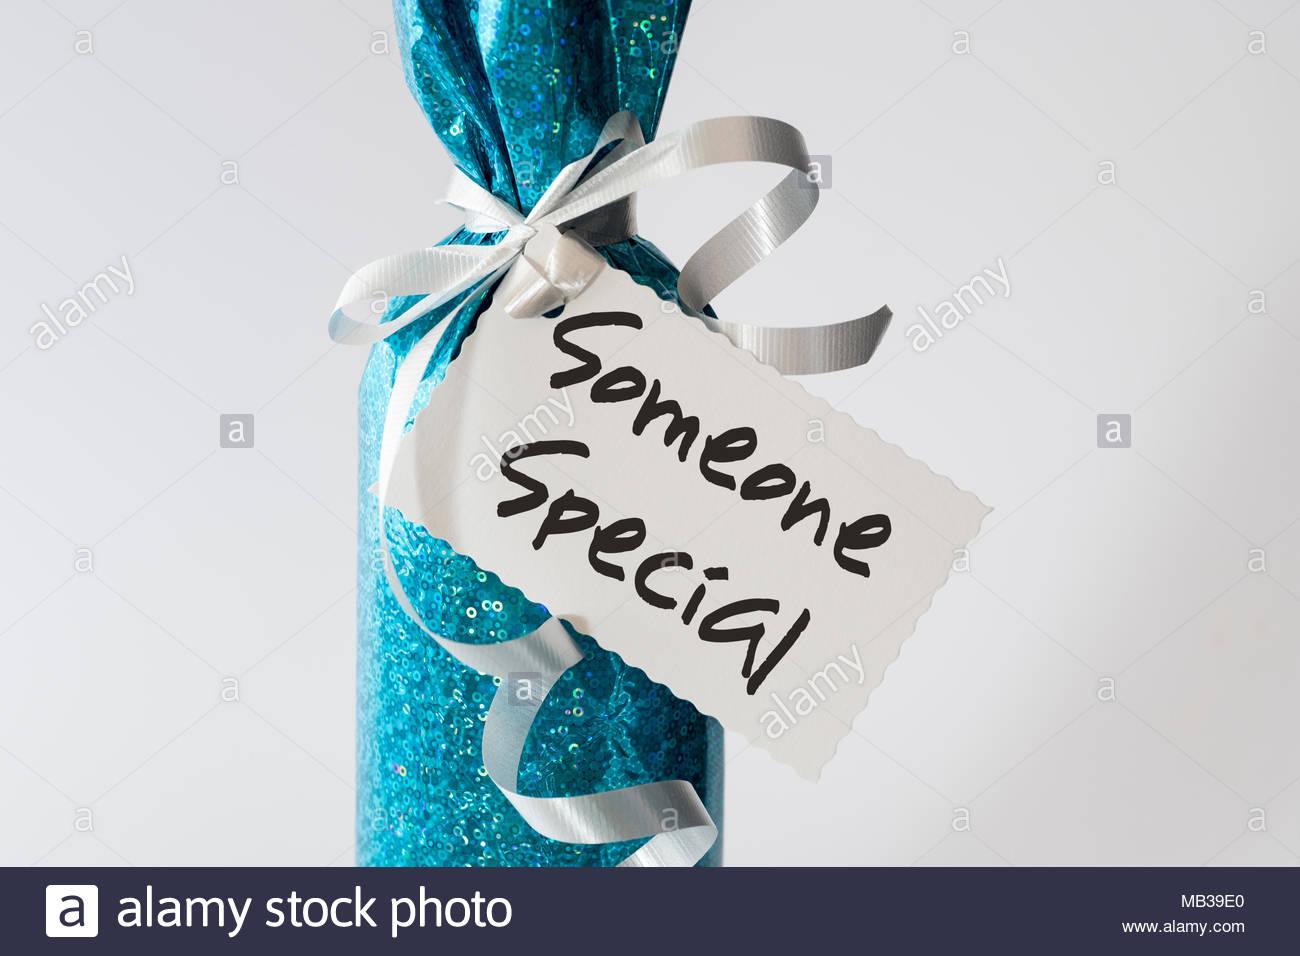 For Someone Special Stockfotos & For Someone Special Bilder - Alamy